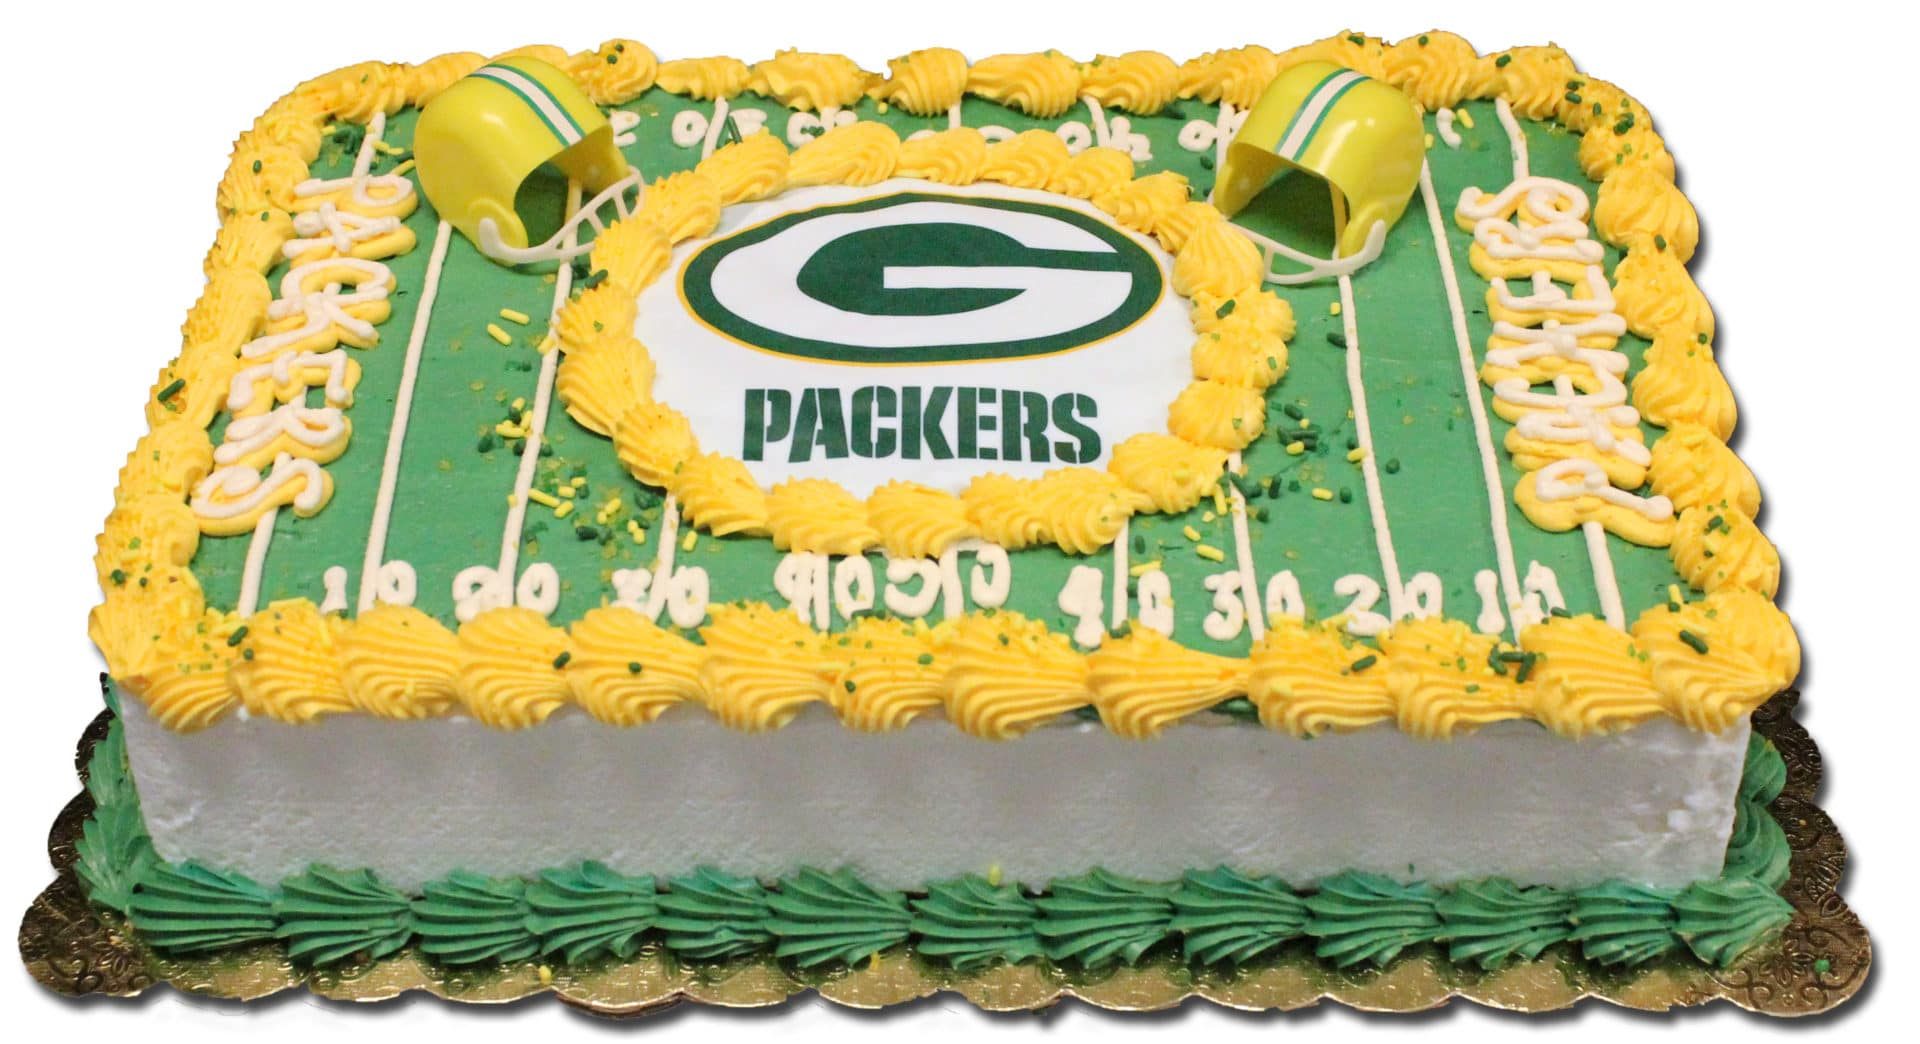 Swell Packer Field Cake Aggies Bakery Cake Shop Personalised Birthday Cards Veneteletsinfo